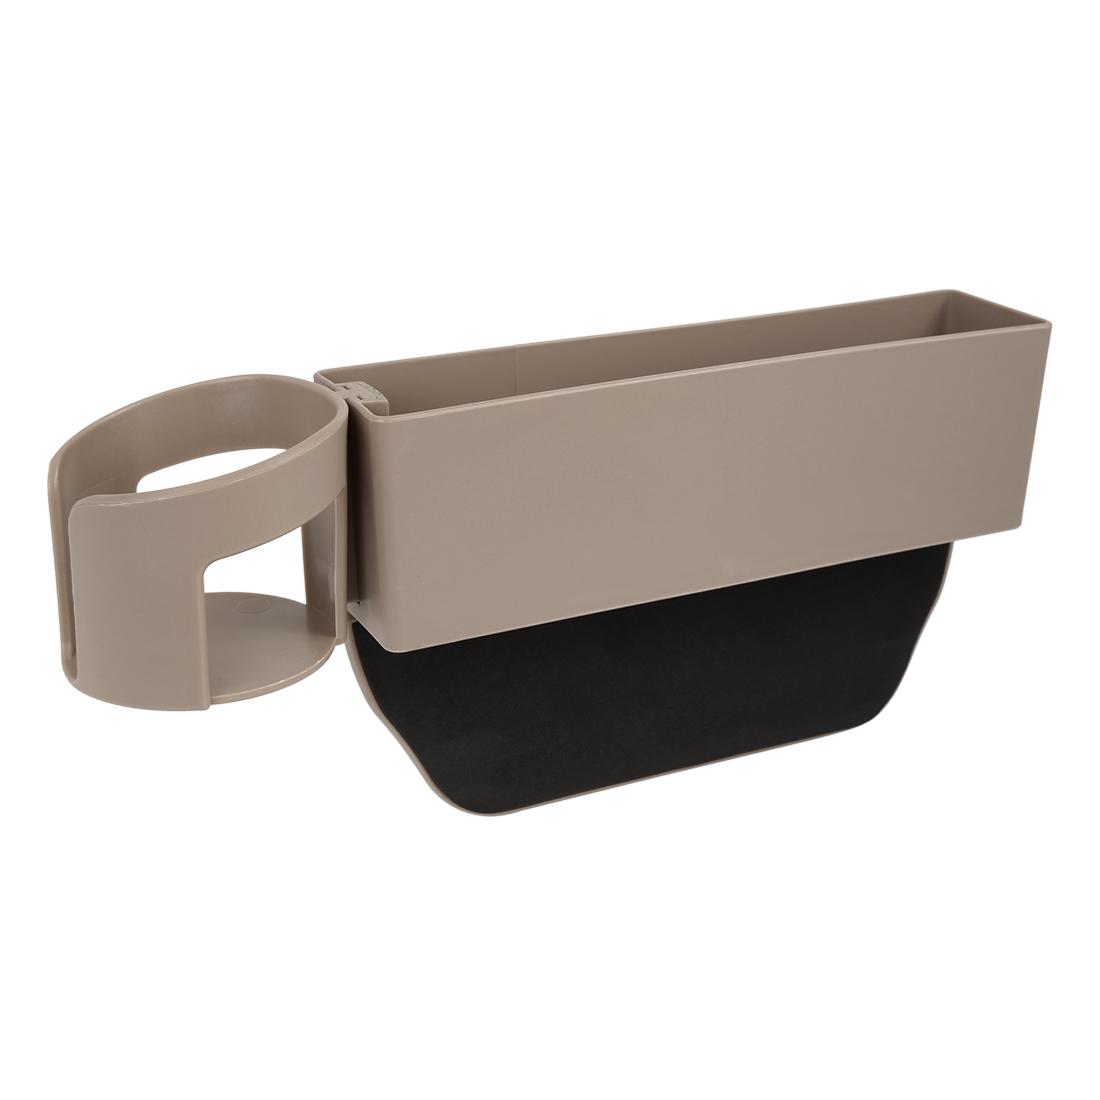 Beige Car Seat Gap Crevice Storage Side Catcher Organizer Pocket Stow Detachable